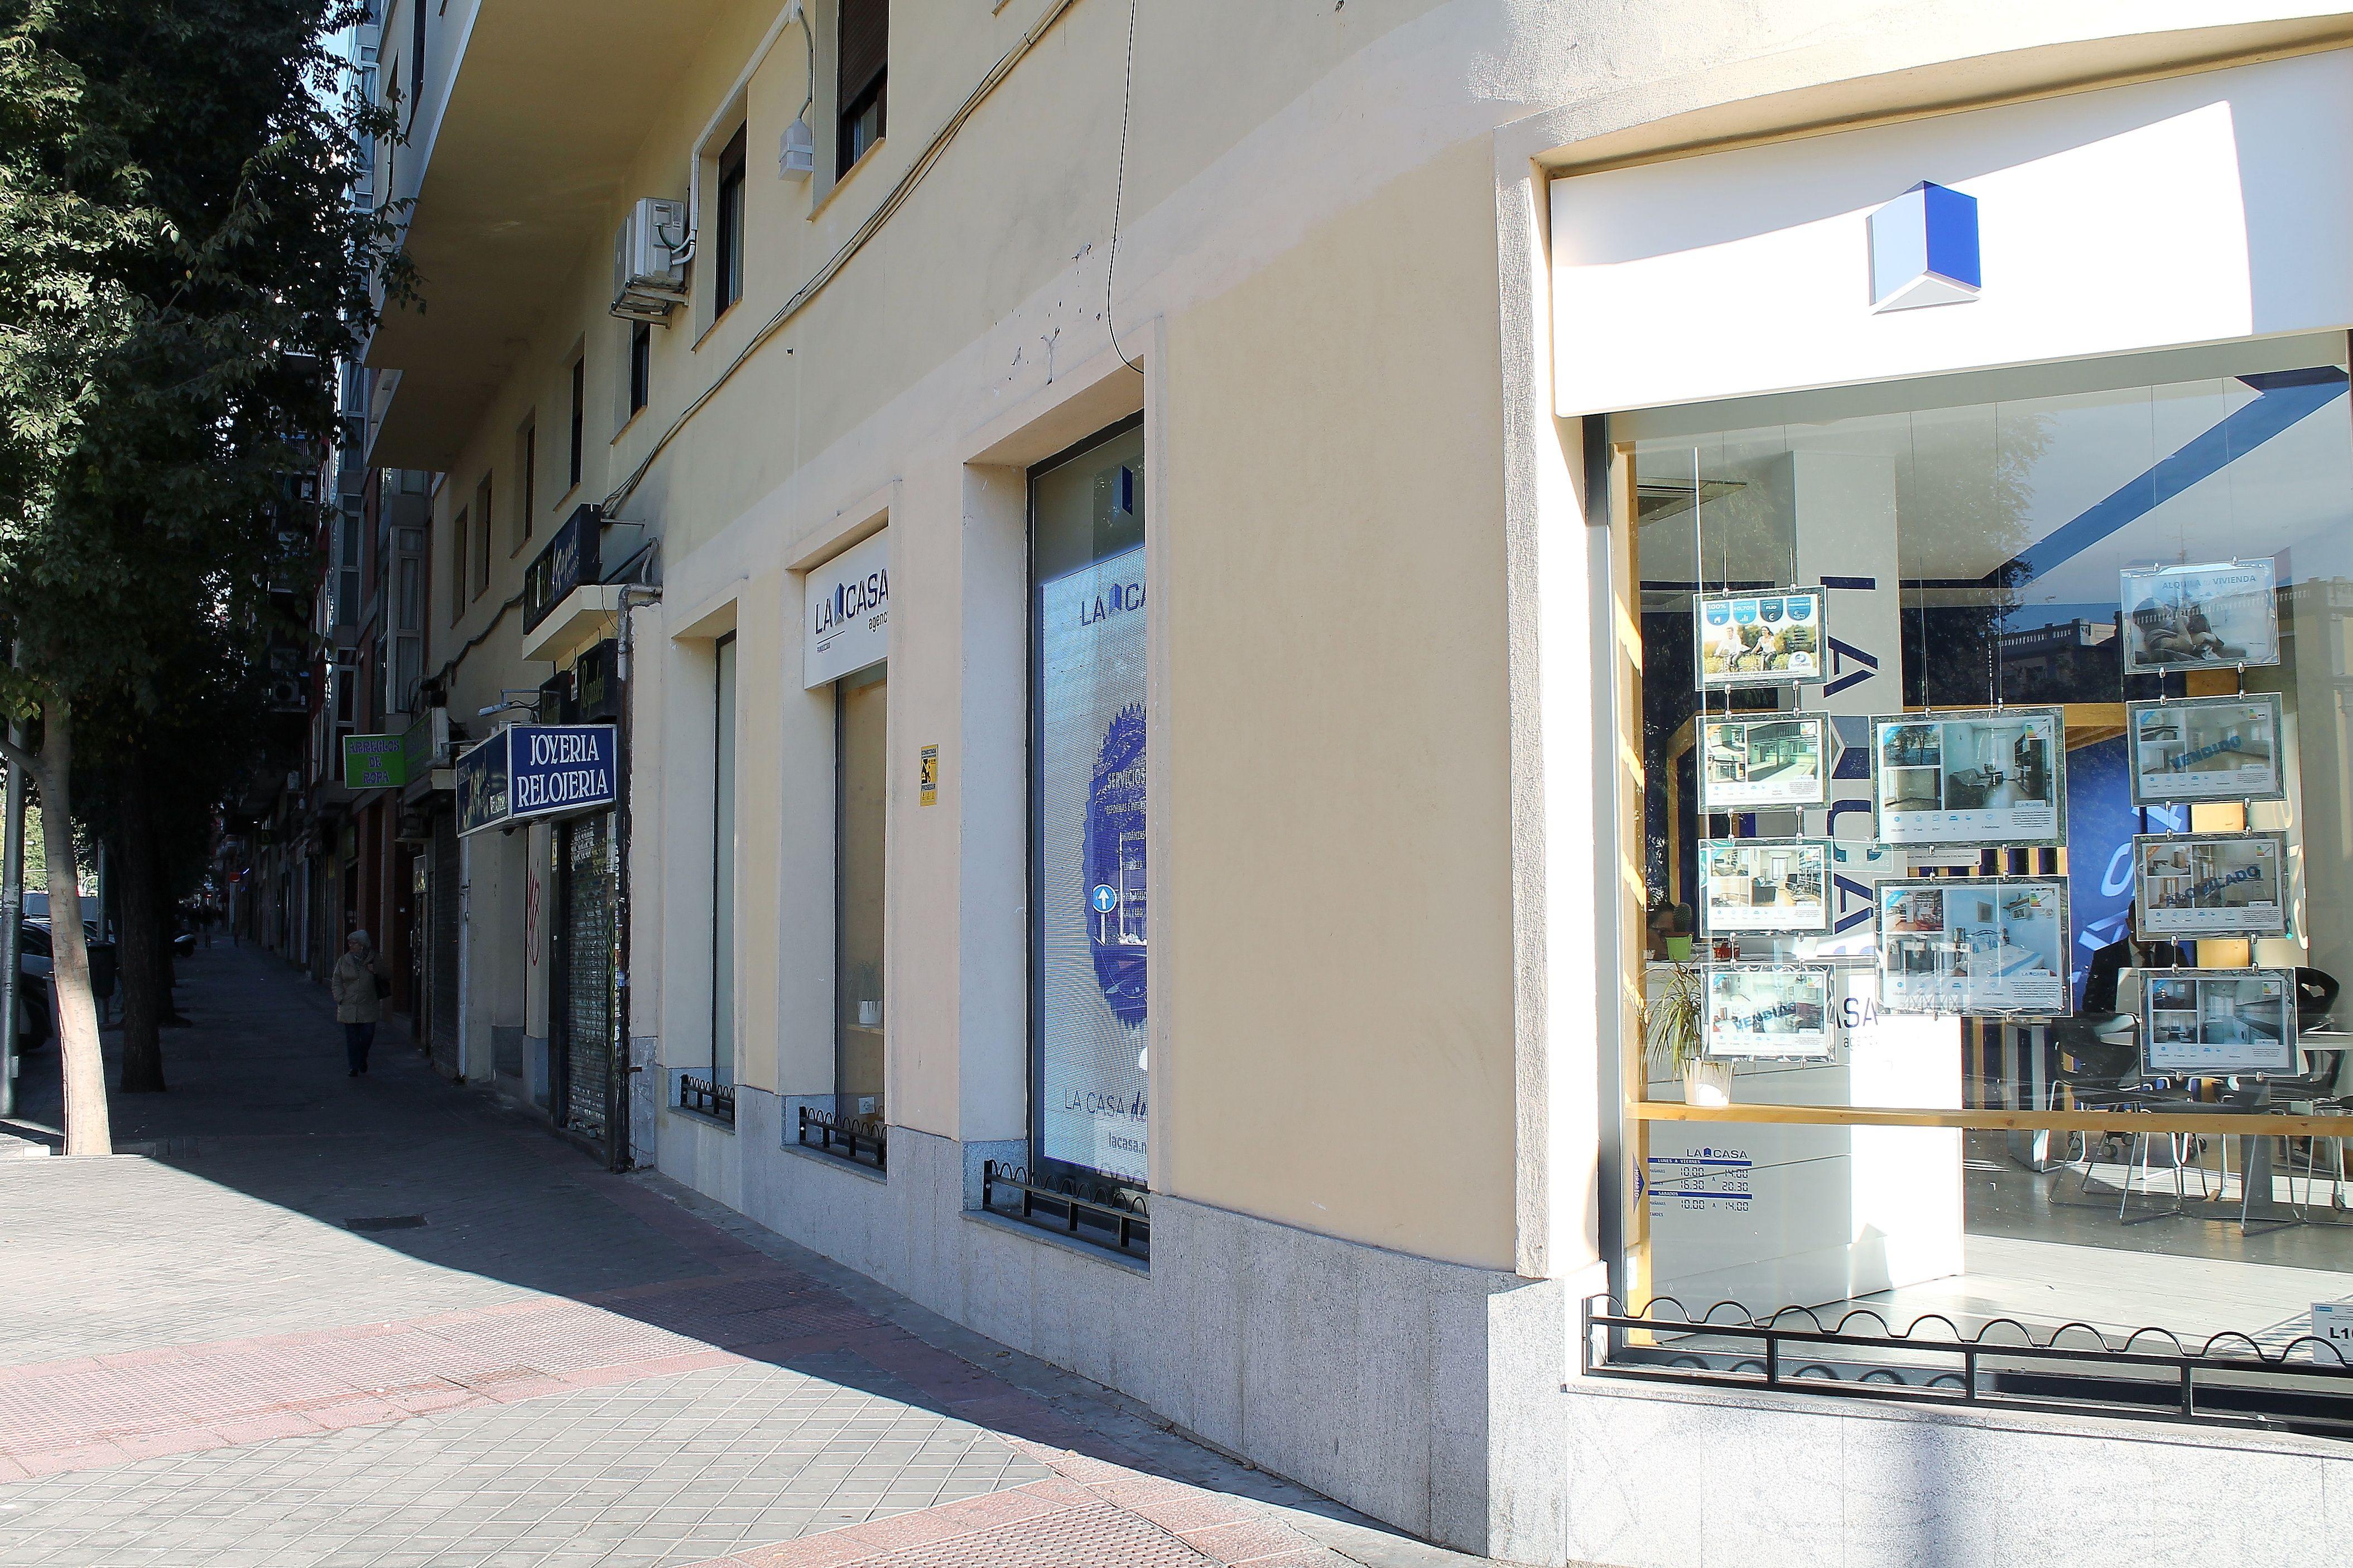 Inmobiliarias en Arganzuela, Madrid